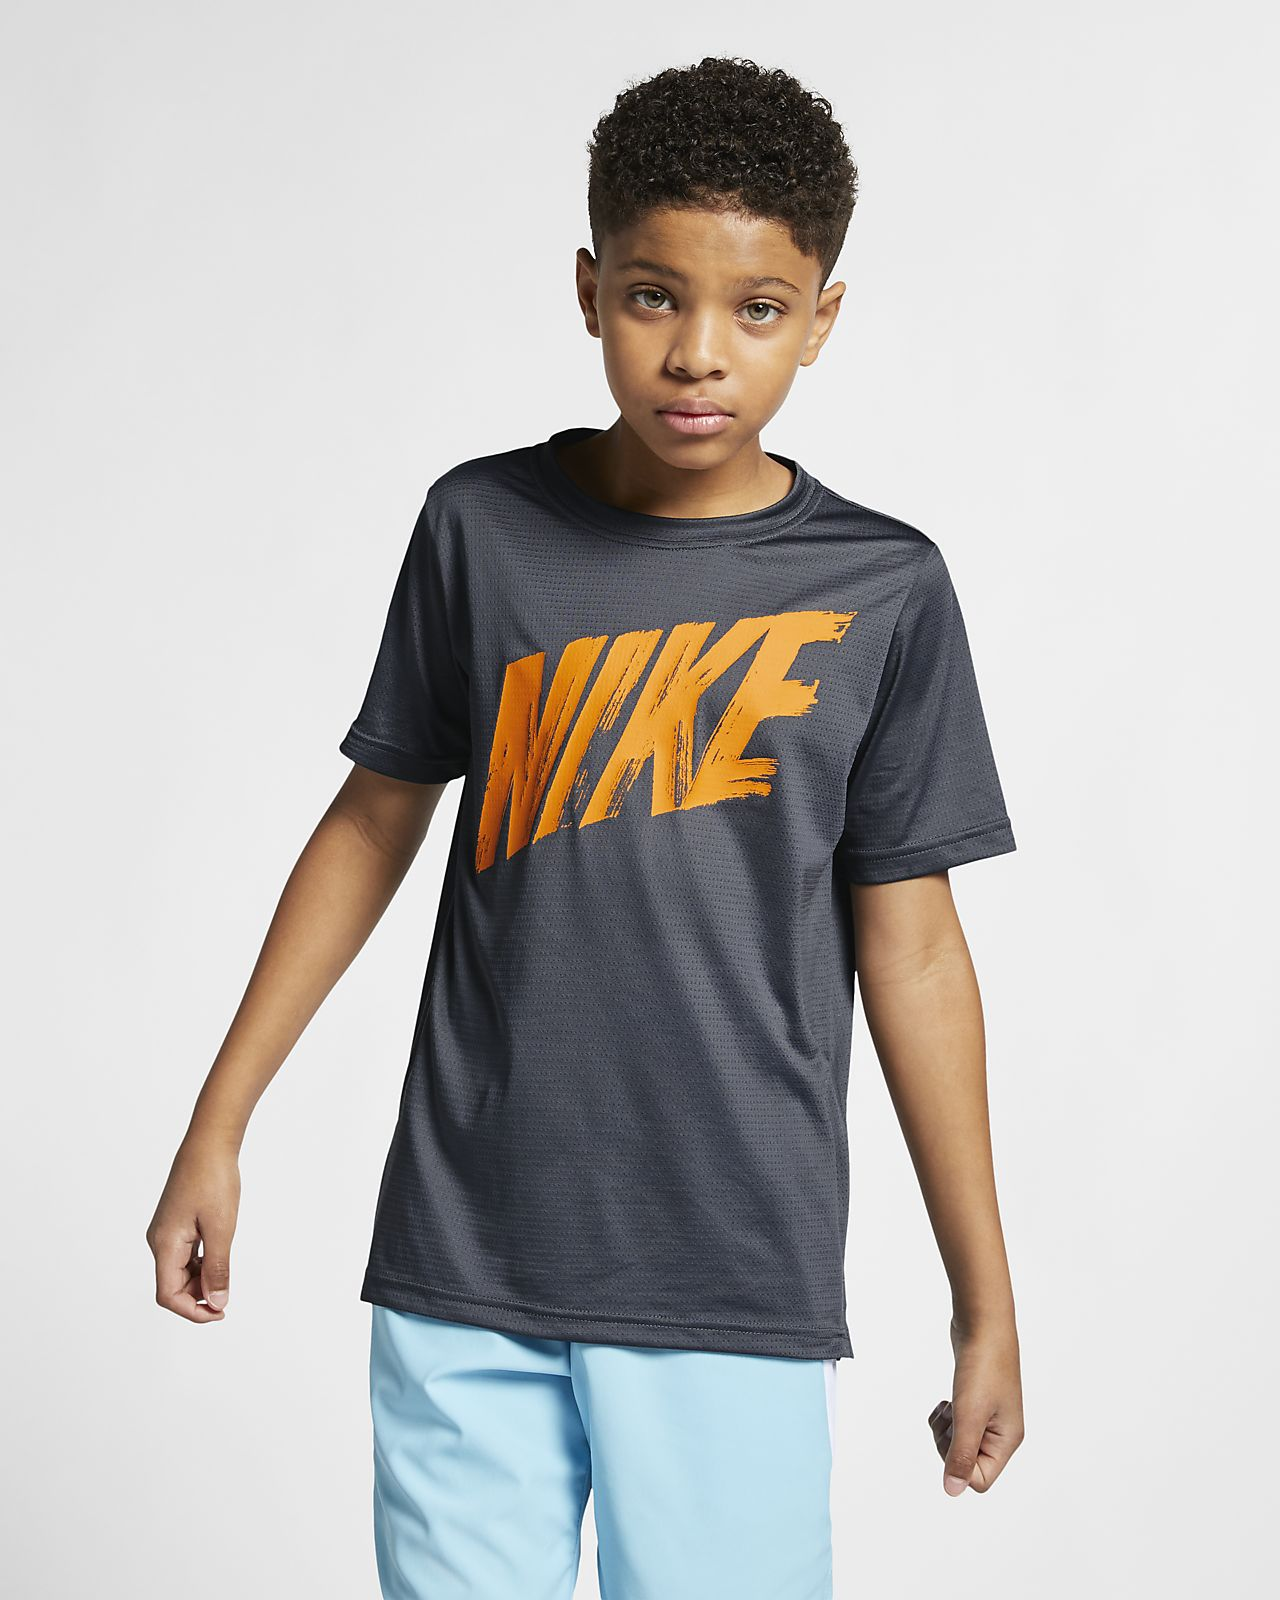 Nike Dri-FIT Kurzarm-Trainingsoberteil für ältere Kinder (Jungen)